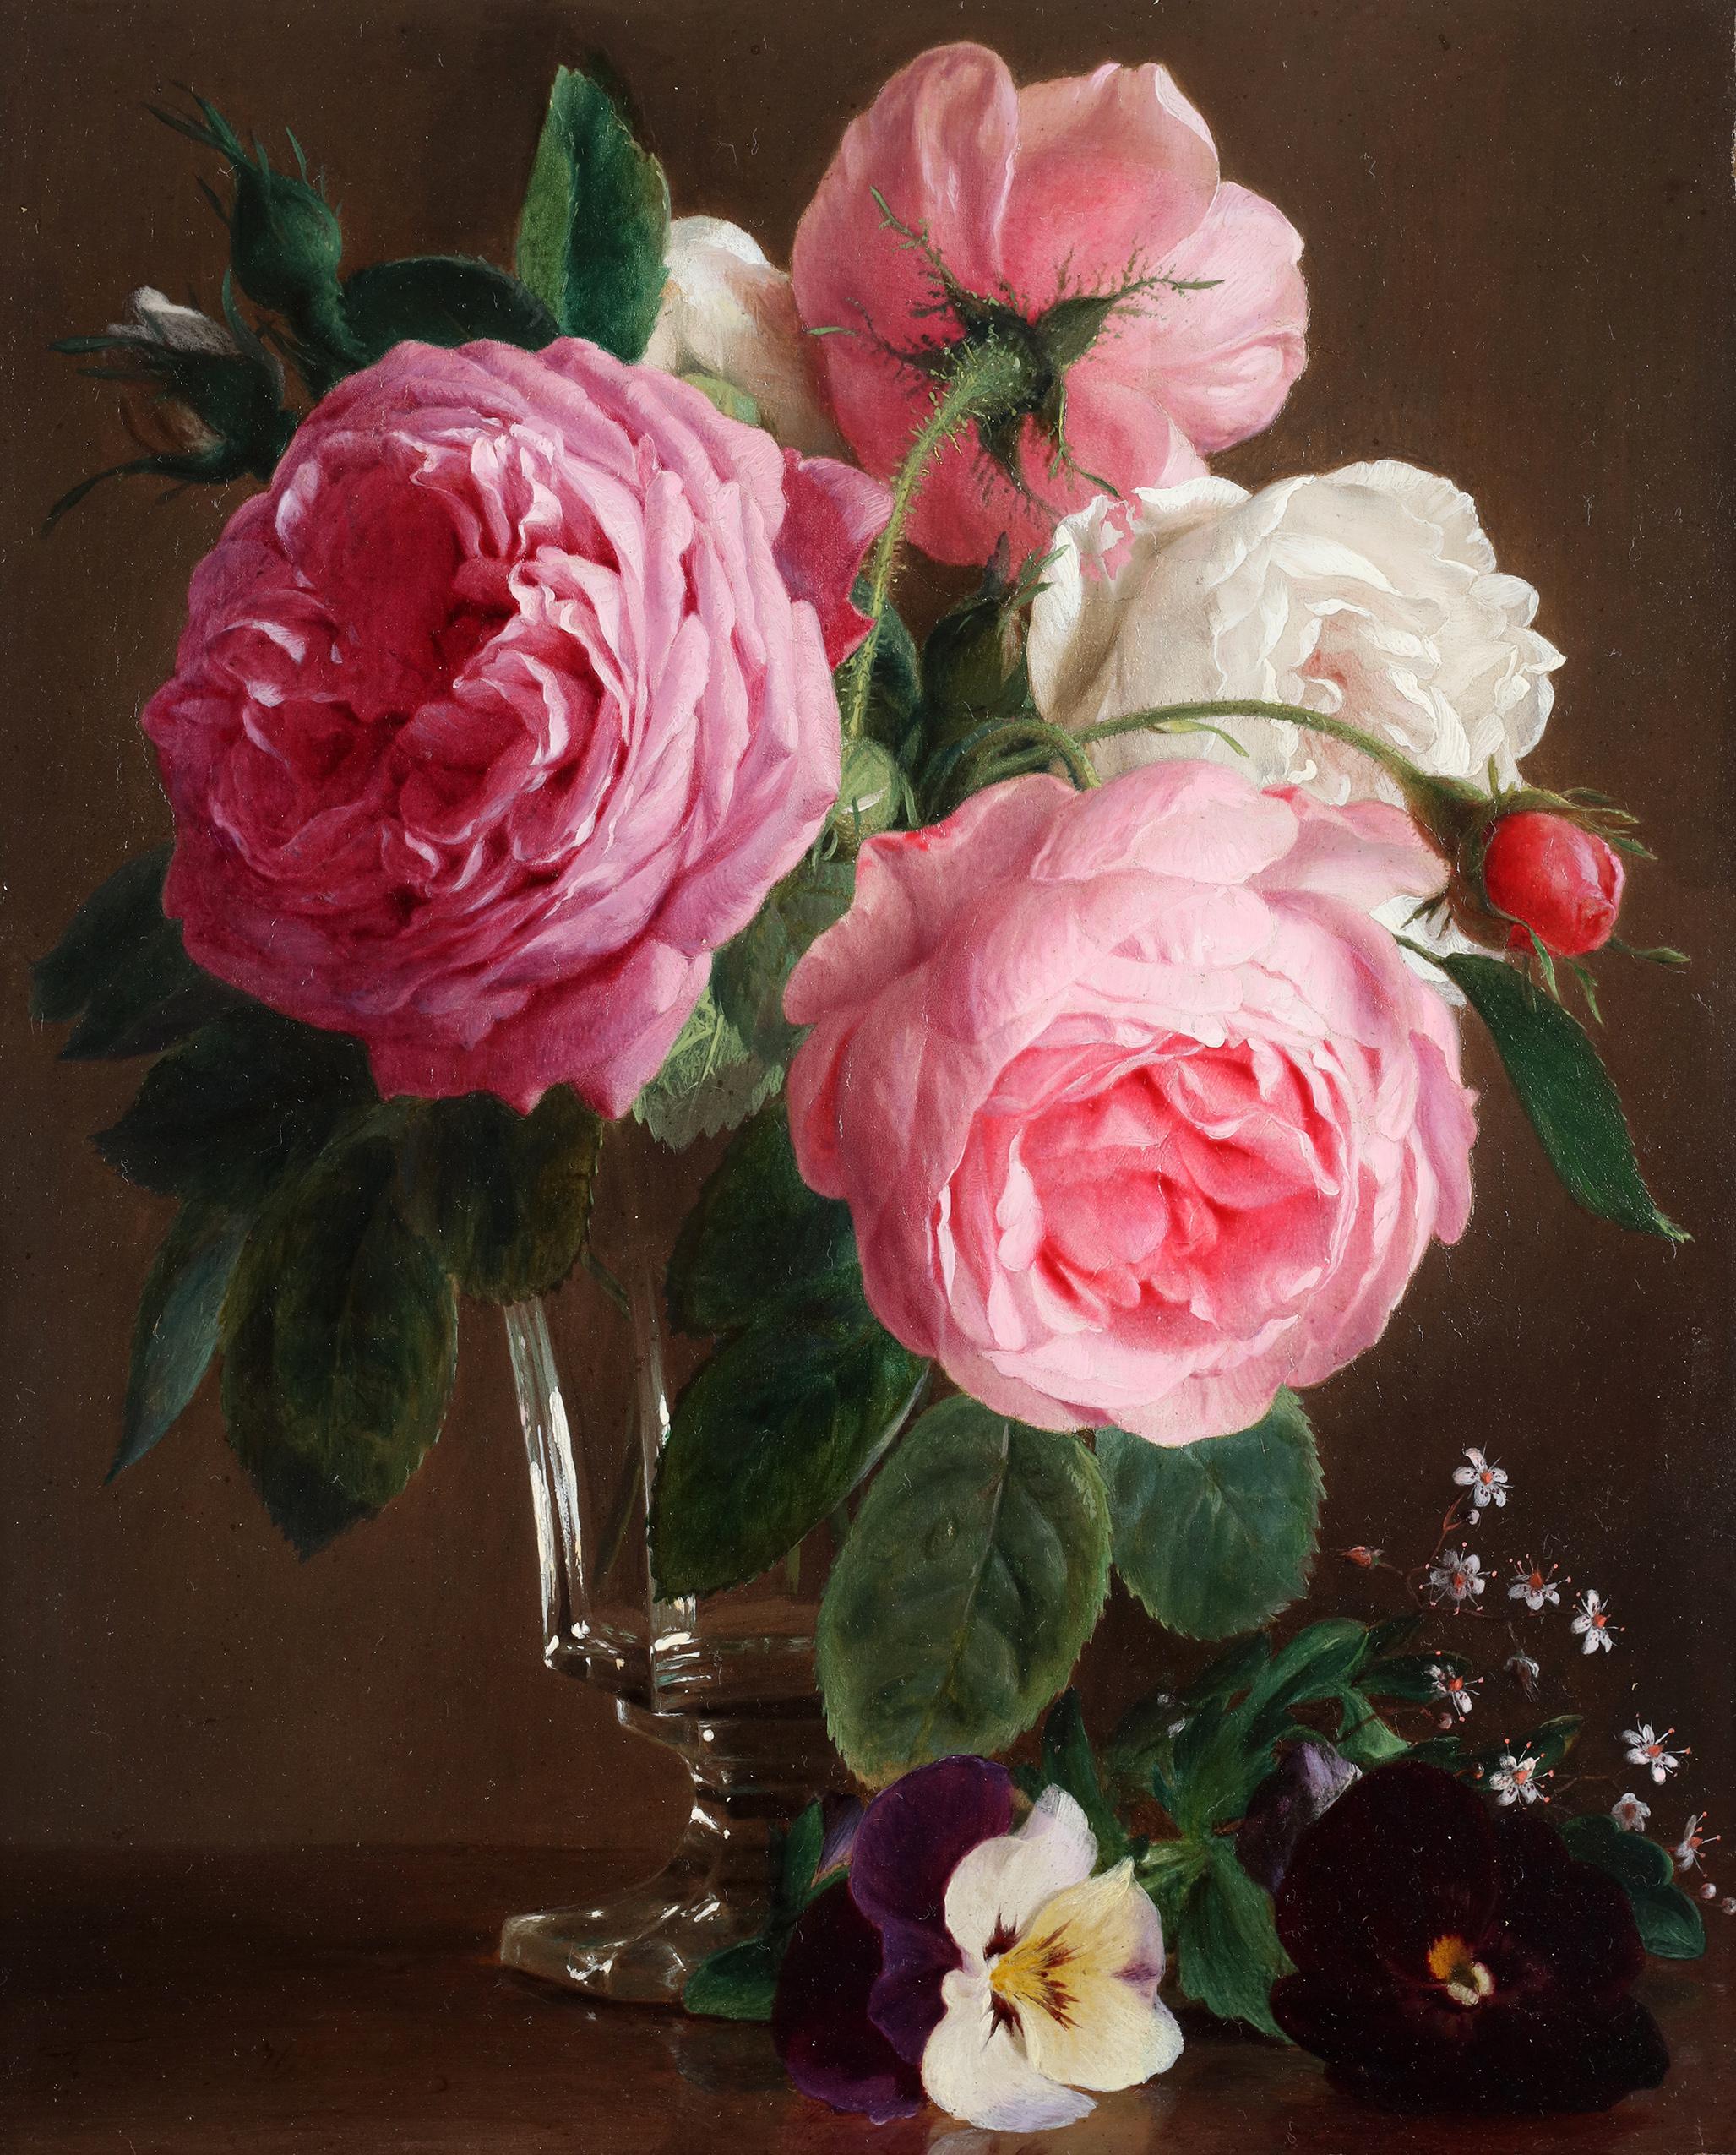 Roses in a crystal vase